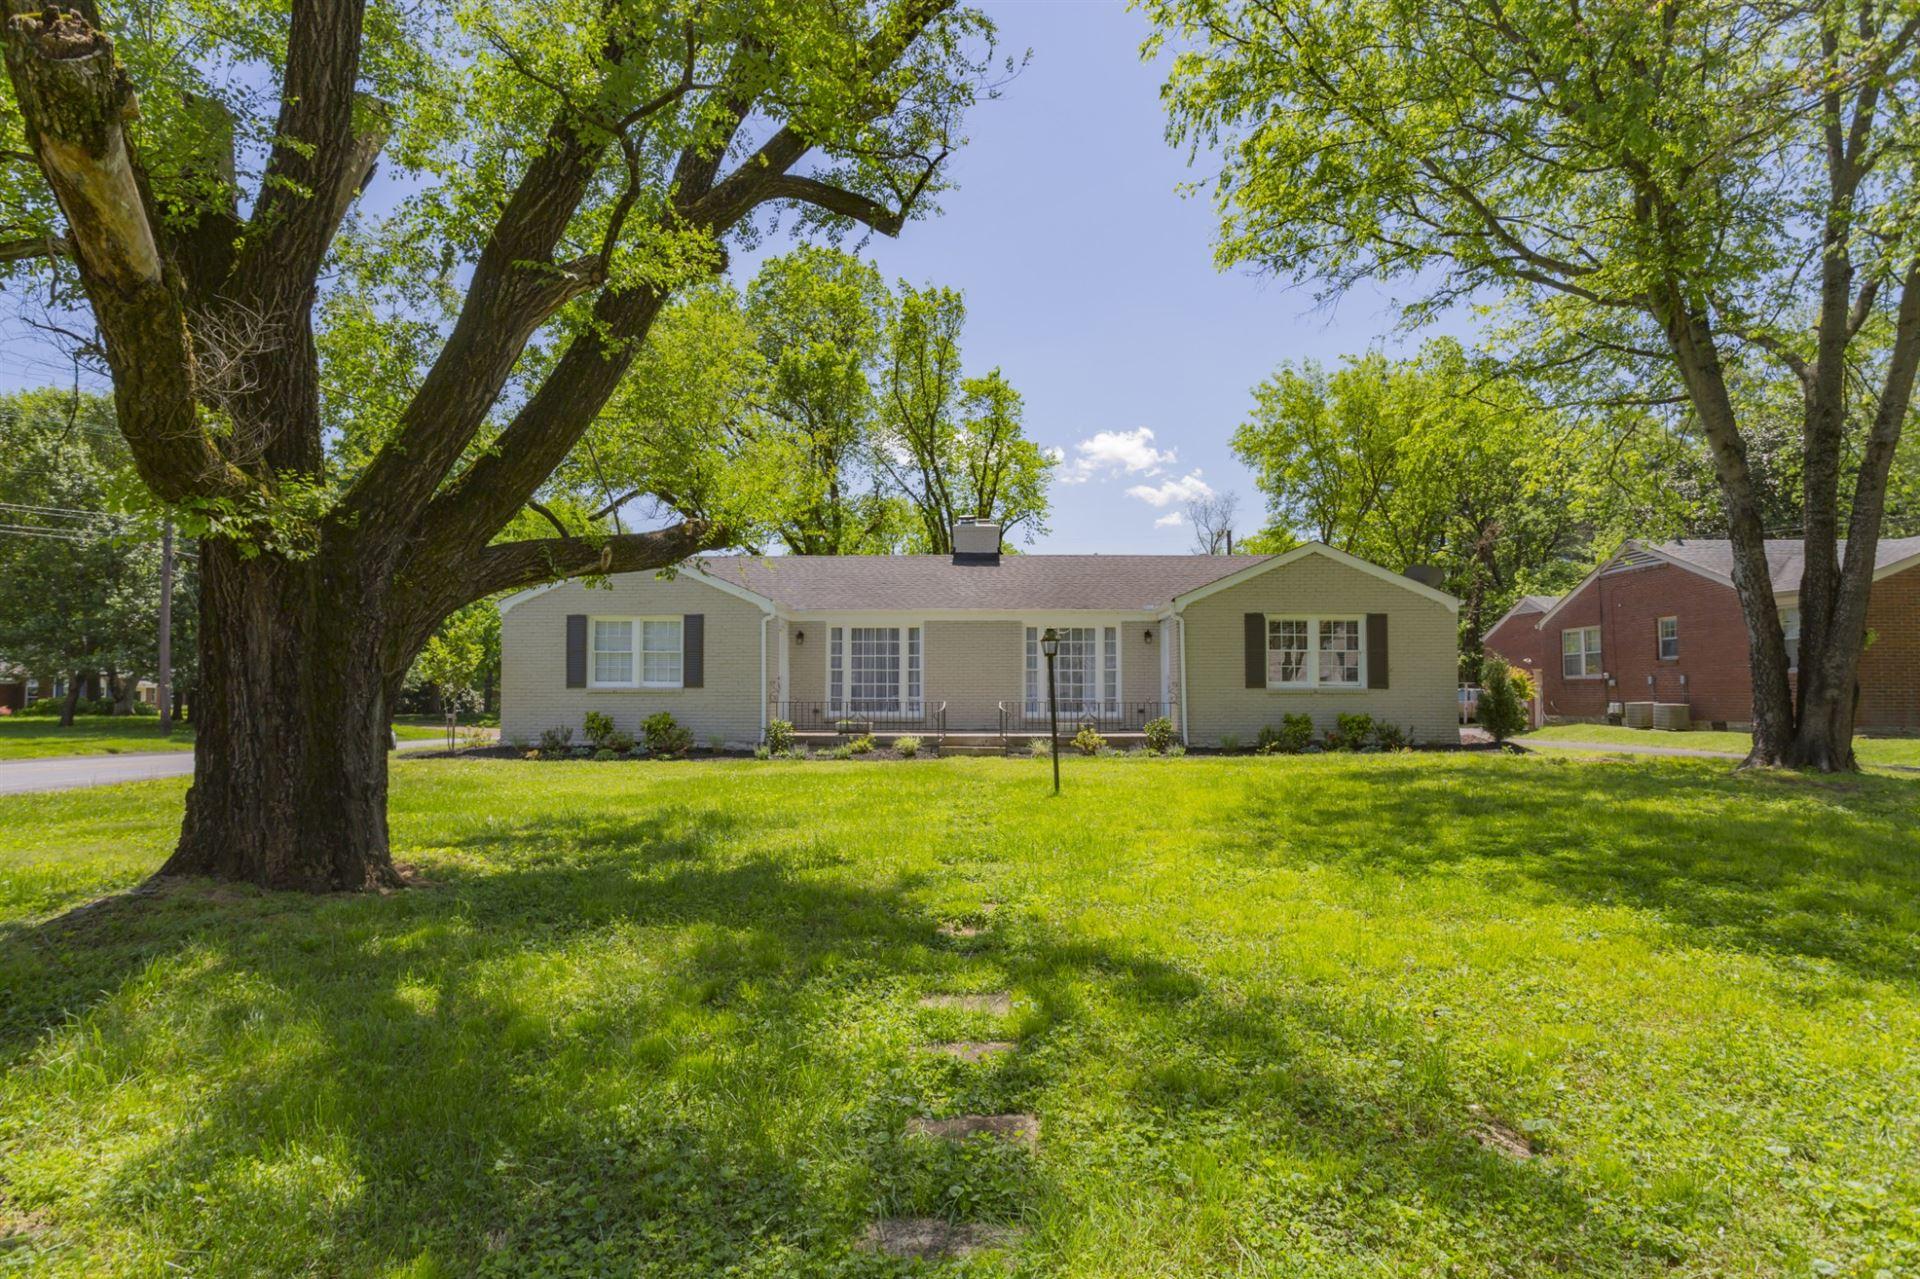 Photo of 1001A Woodmont Blvd, Nashville, TN 37204 (MLS # 2263449)